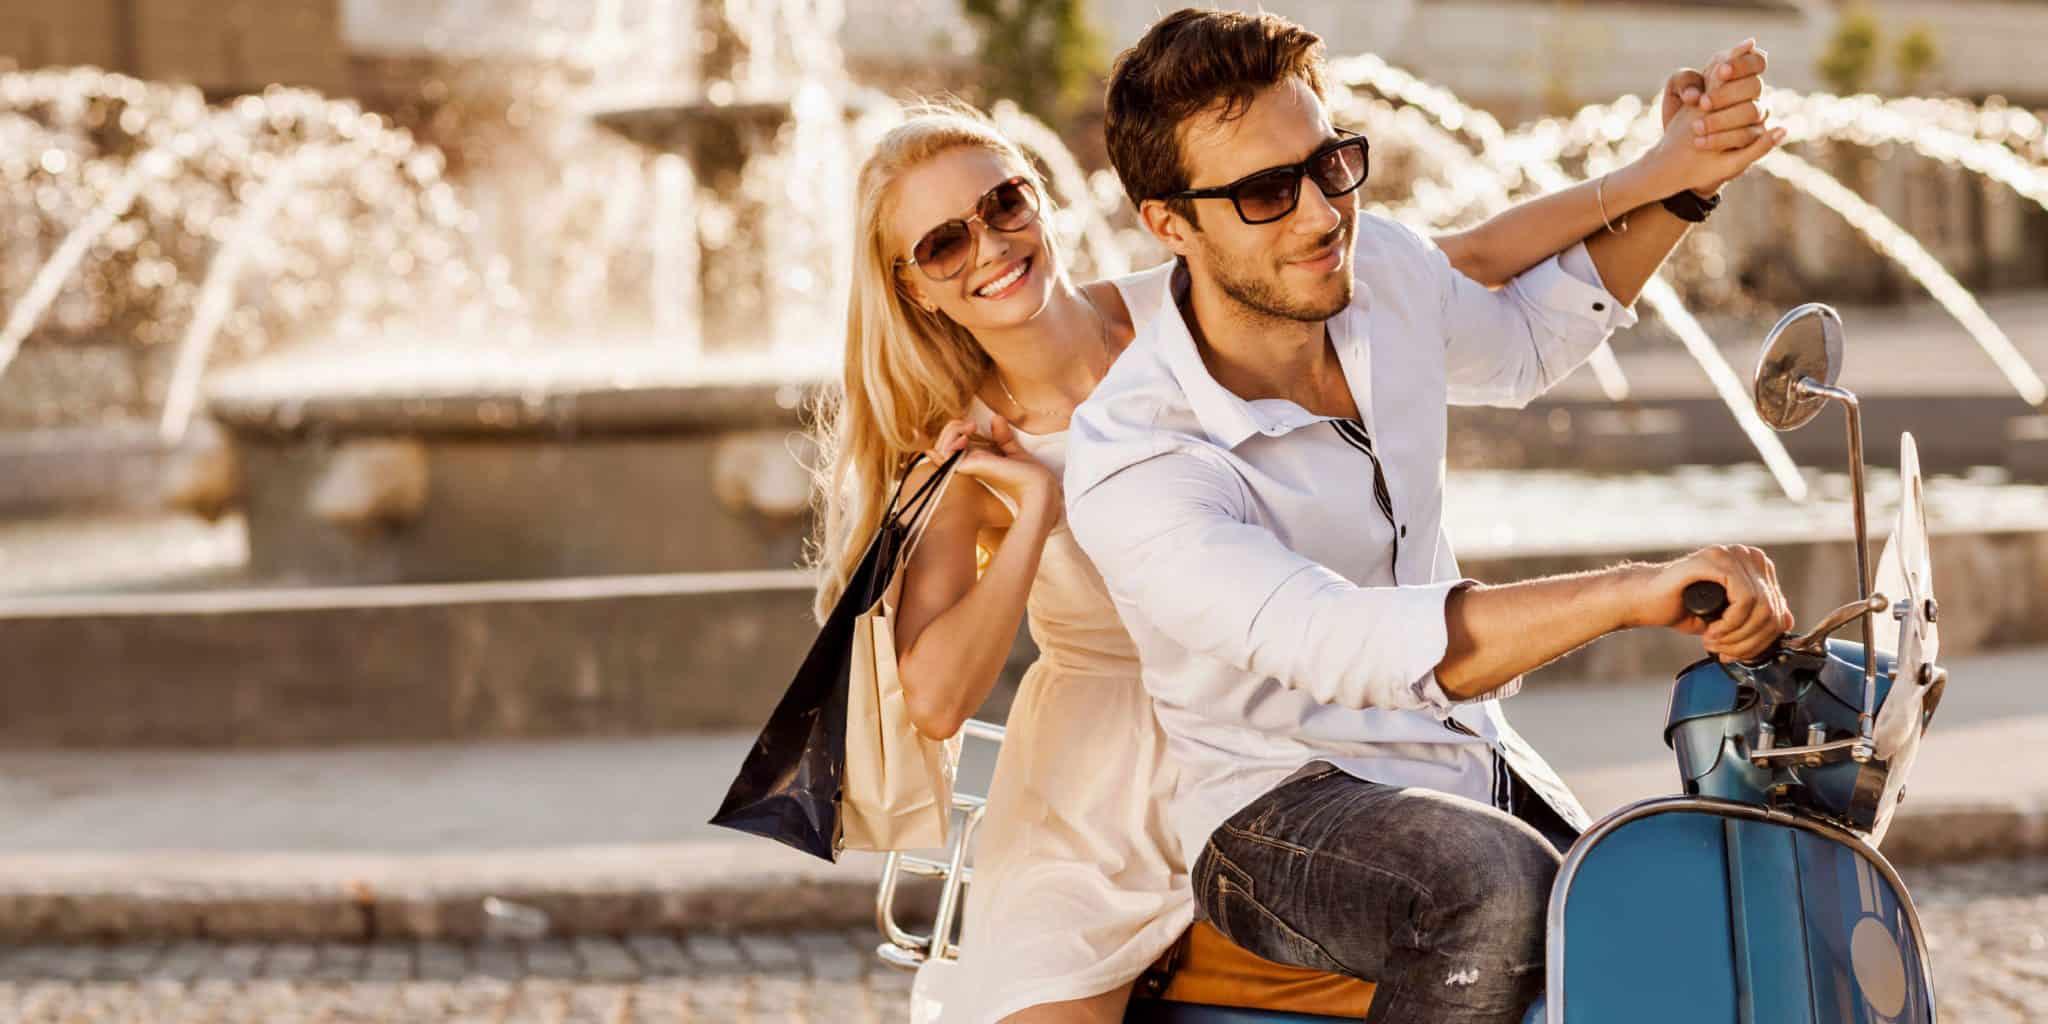 Italian lifestyle 10 ways to experience la dolce vita